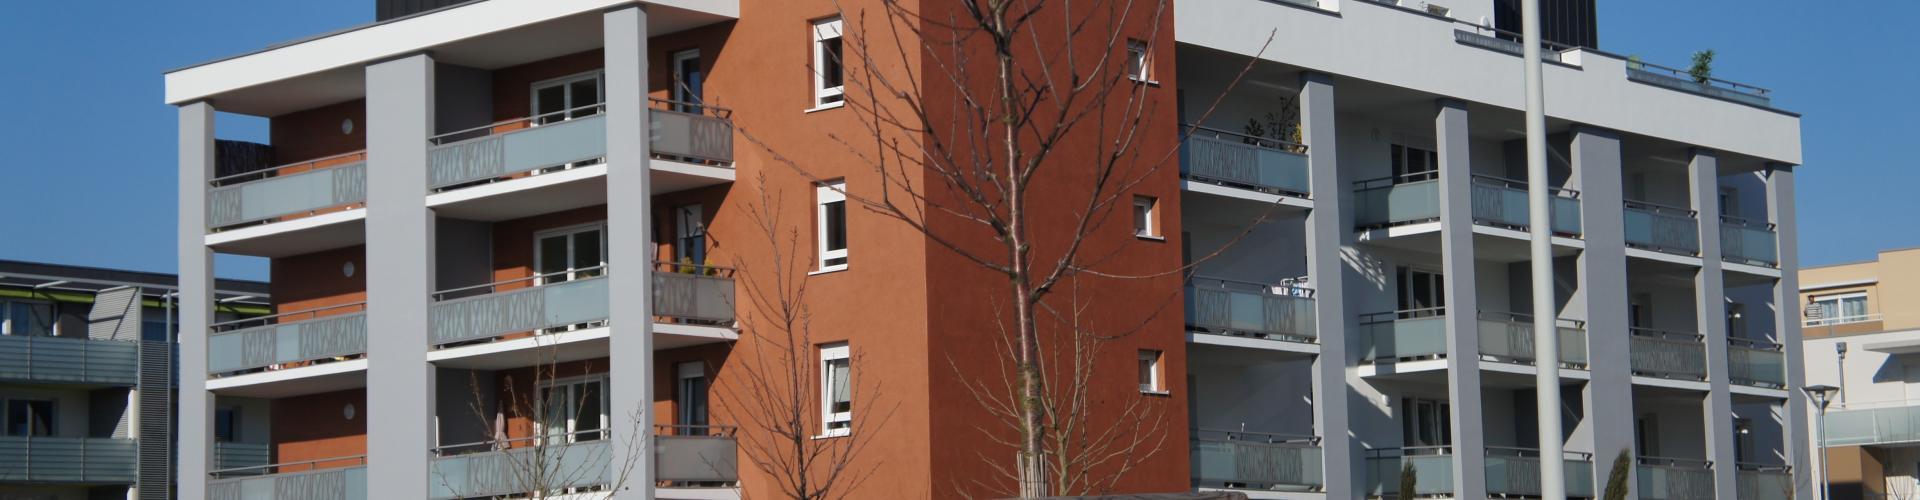 Programme immobilier neuf Greenside - Strasbourg